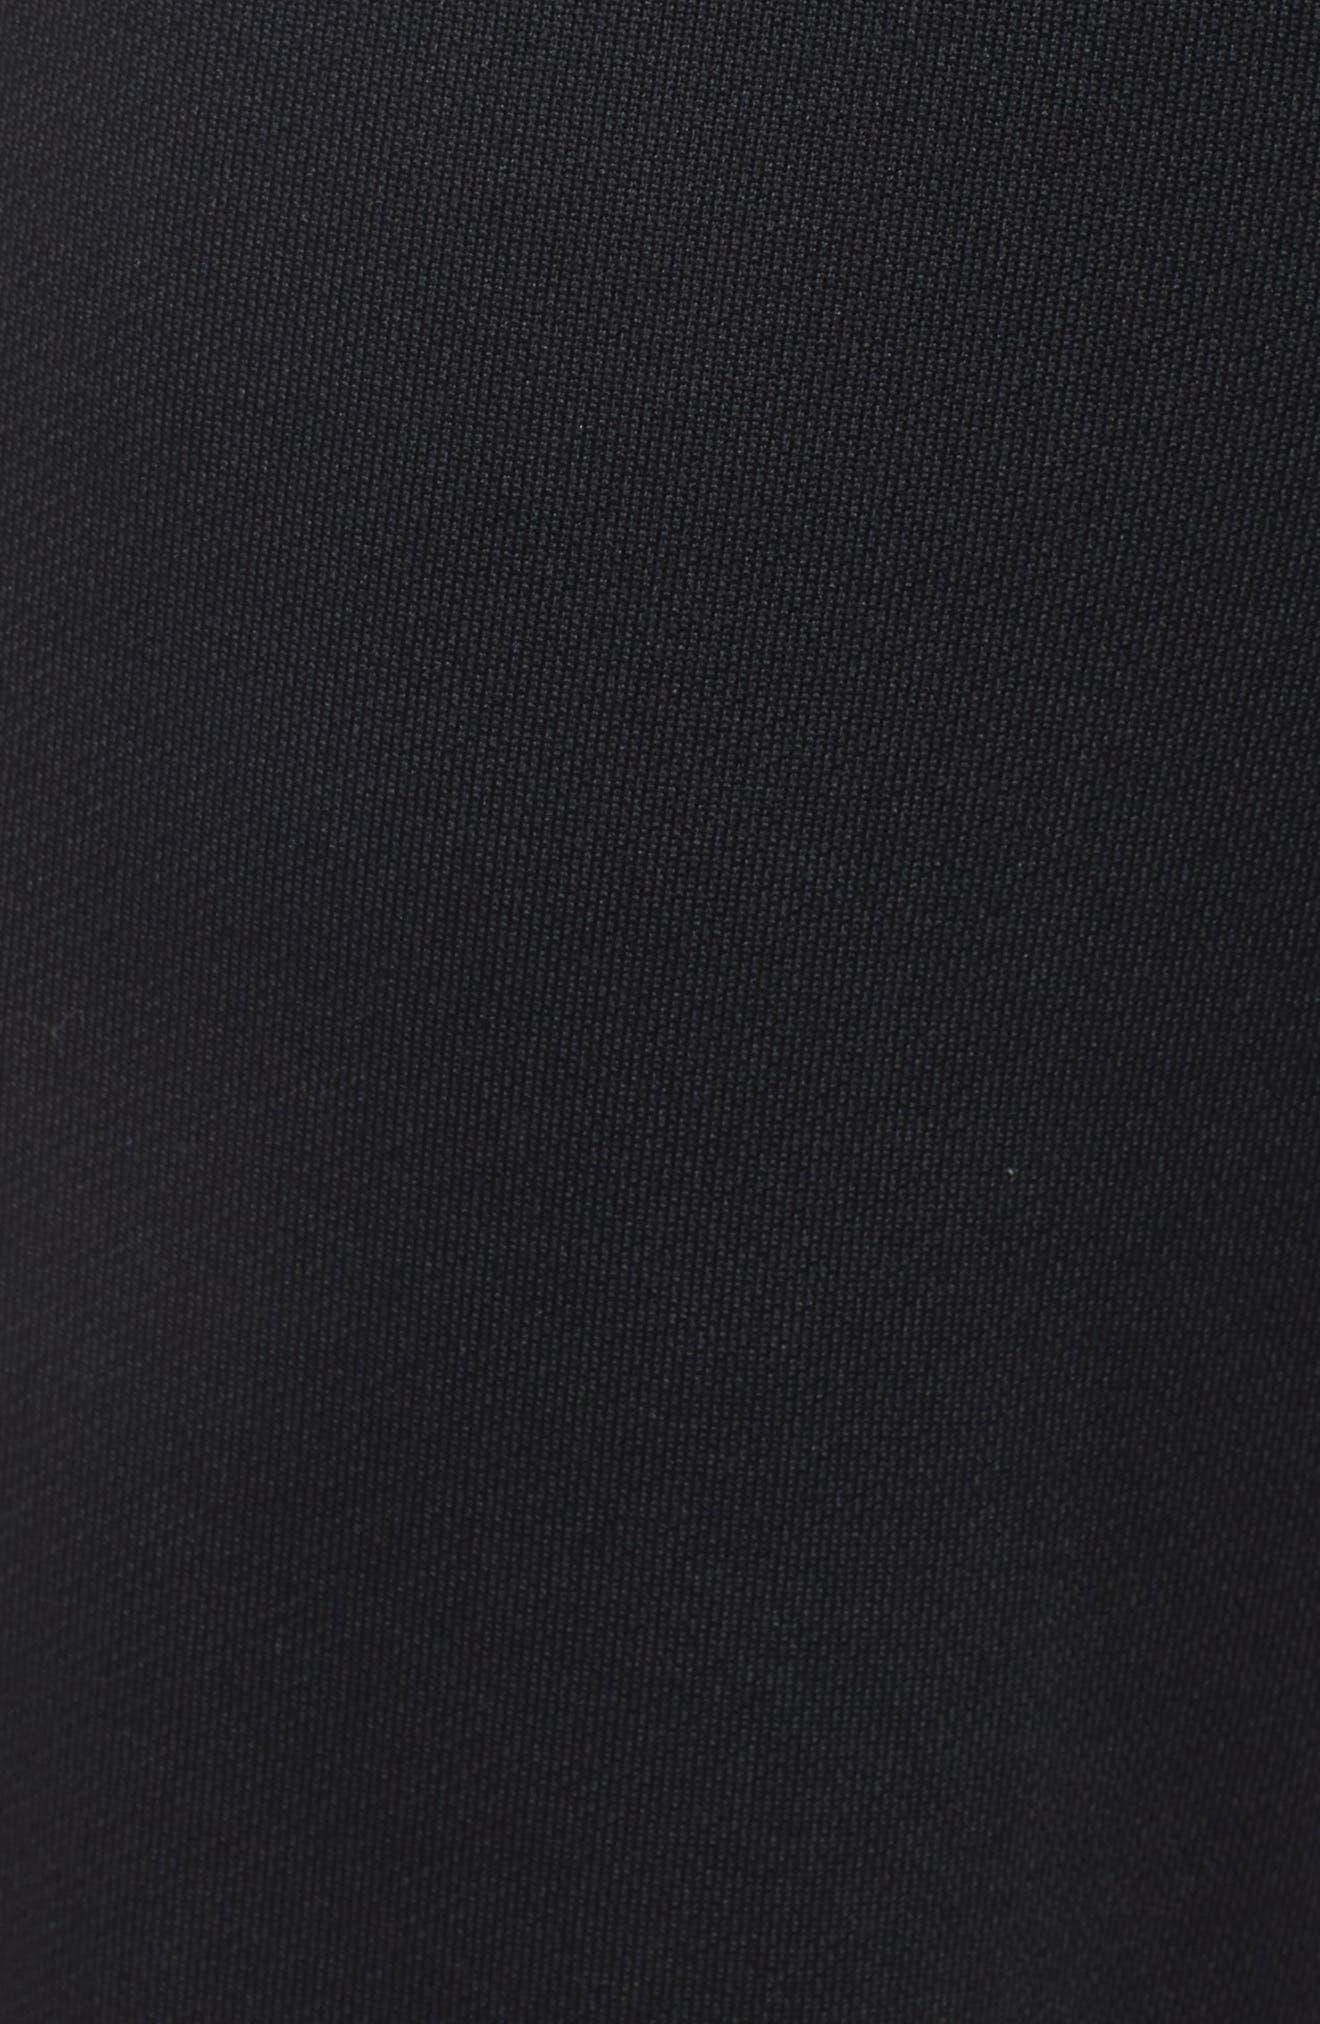 Retro Sweatpants,                             Alternate thumbnail 5, color,                             PUMA BLACK